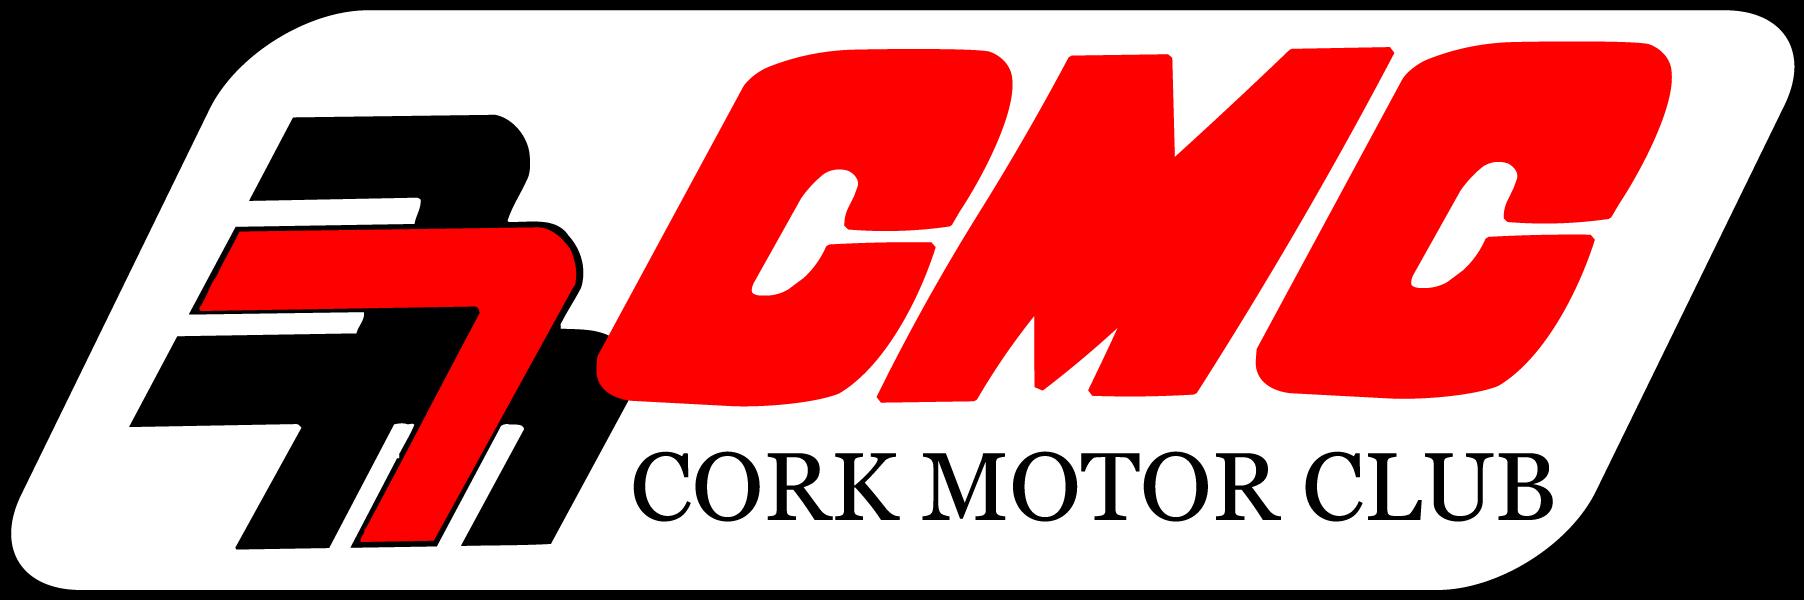 Cork Motor Club